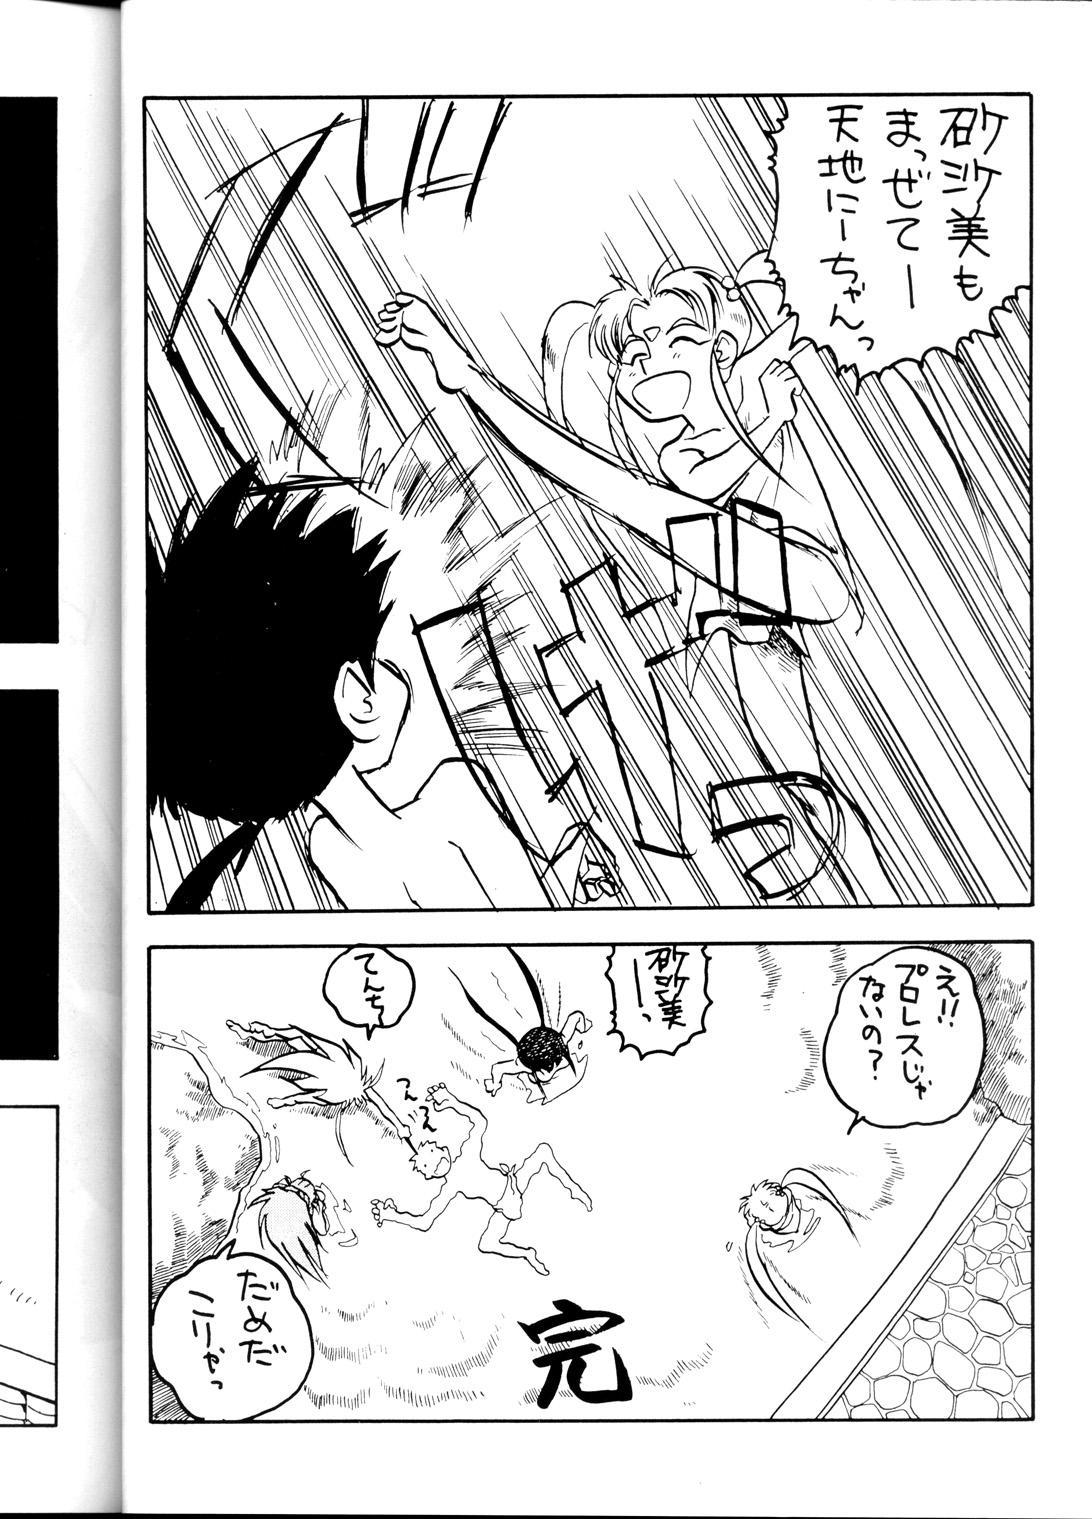 [B.B.C] Tenchi Muyou! Ryou-ou-ki Kaiteiben (Tenchi Muyou!) 34